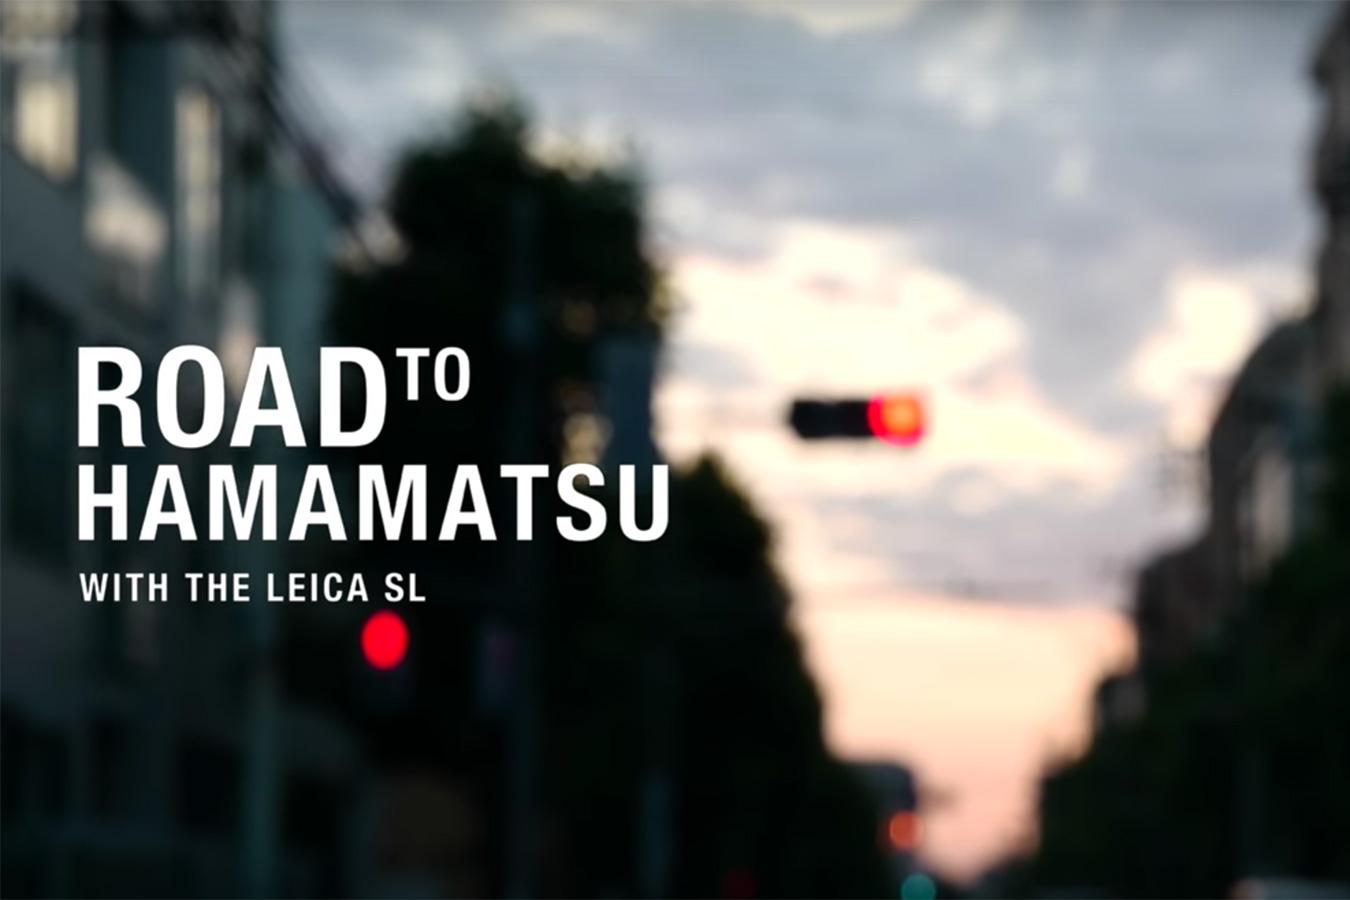 ROAD TO HAMAMATSU With the Leica SL